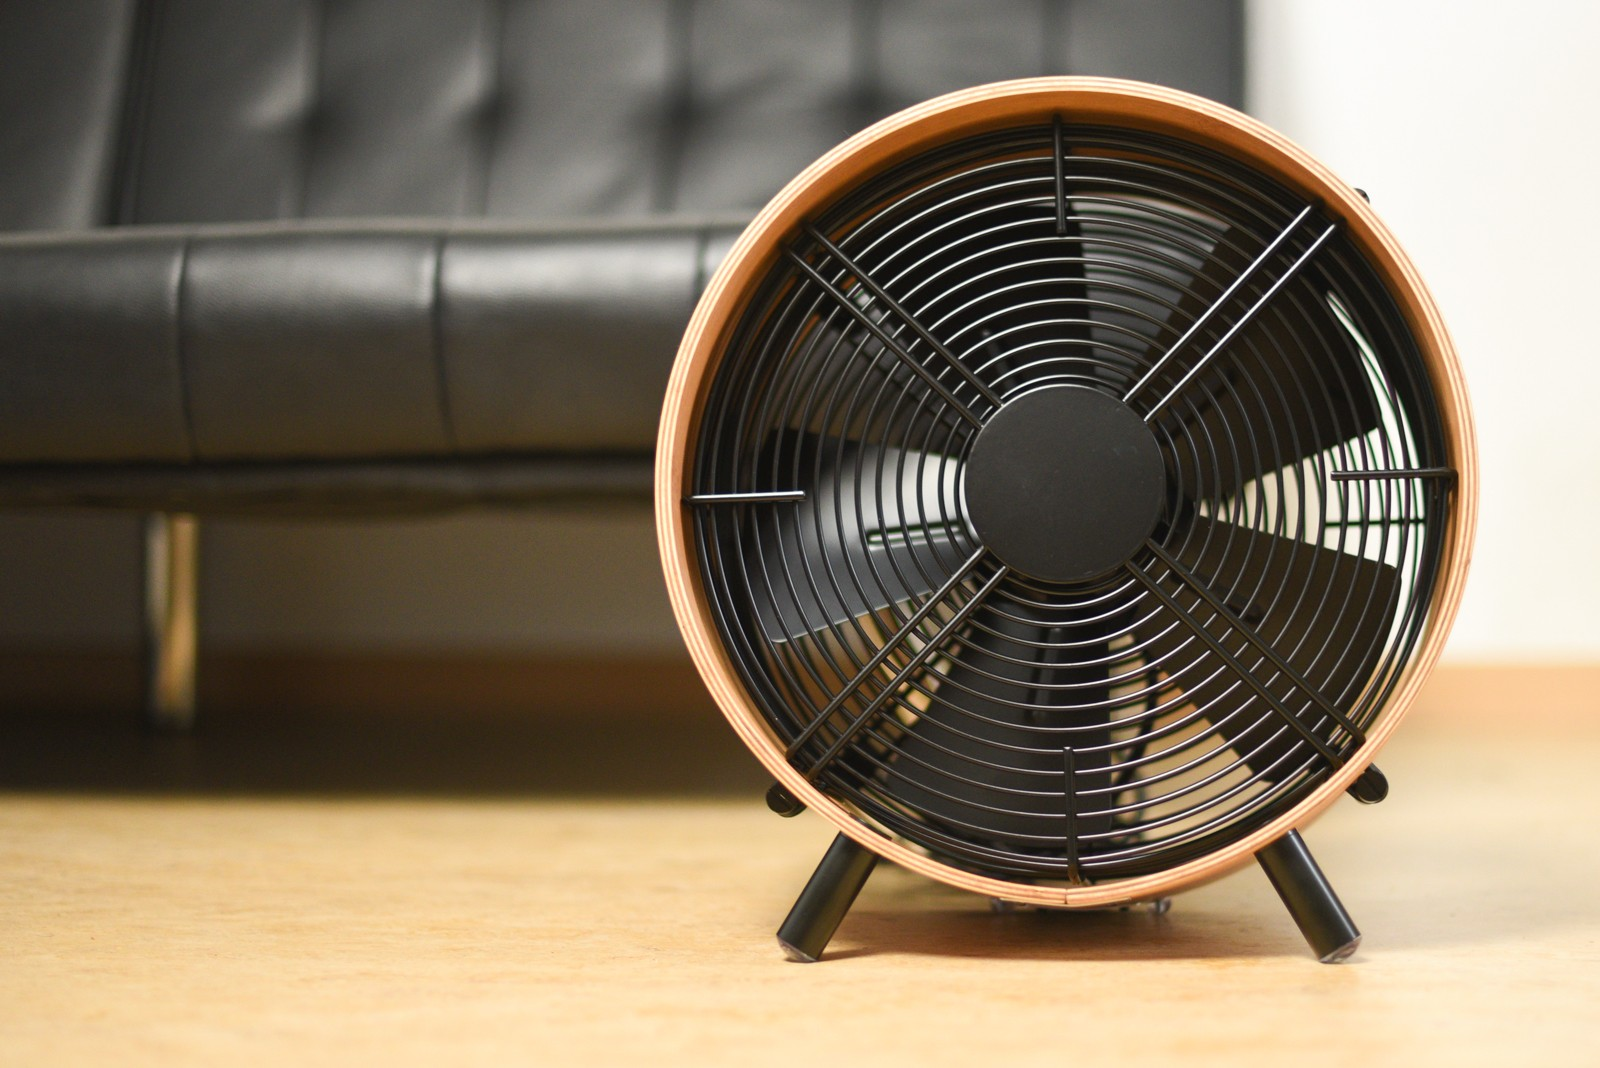 stadler form fan otto bamboo for 40 m rooms portable fans. Black Bedroom Furniture Sets. Home Design Ideas